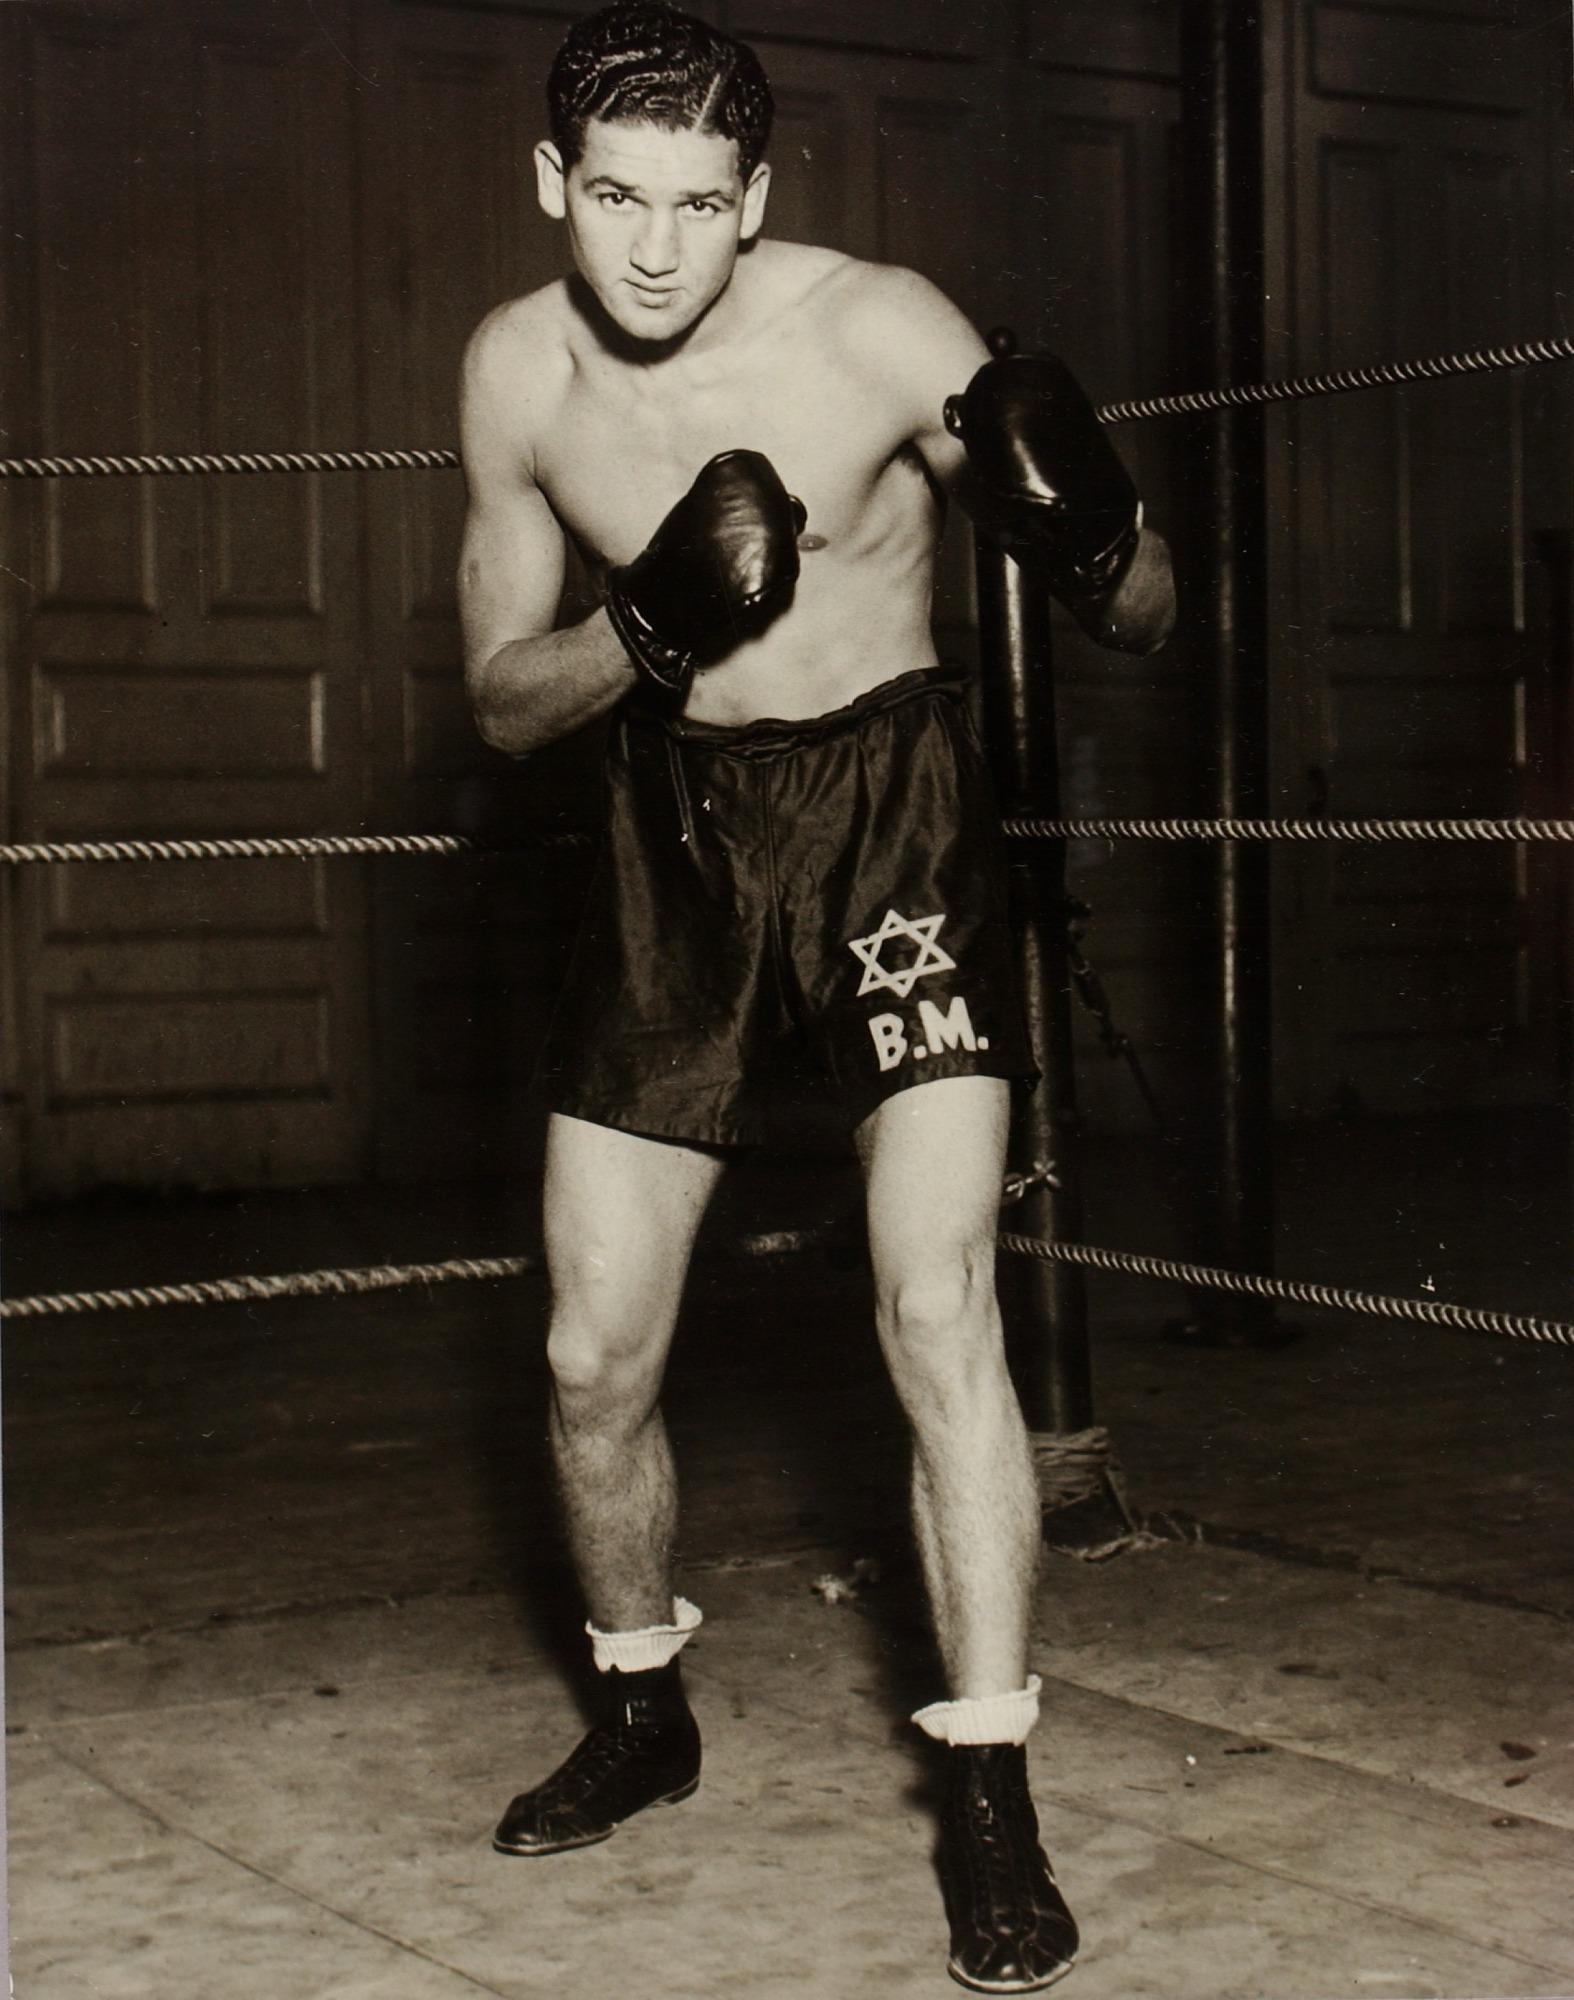 Unidentified boxer, full length portrait